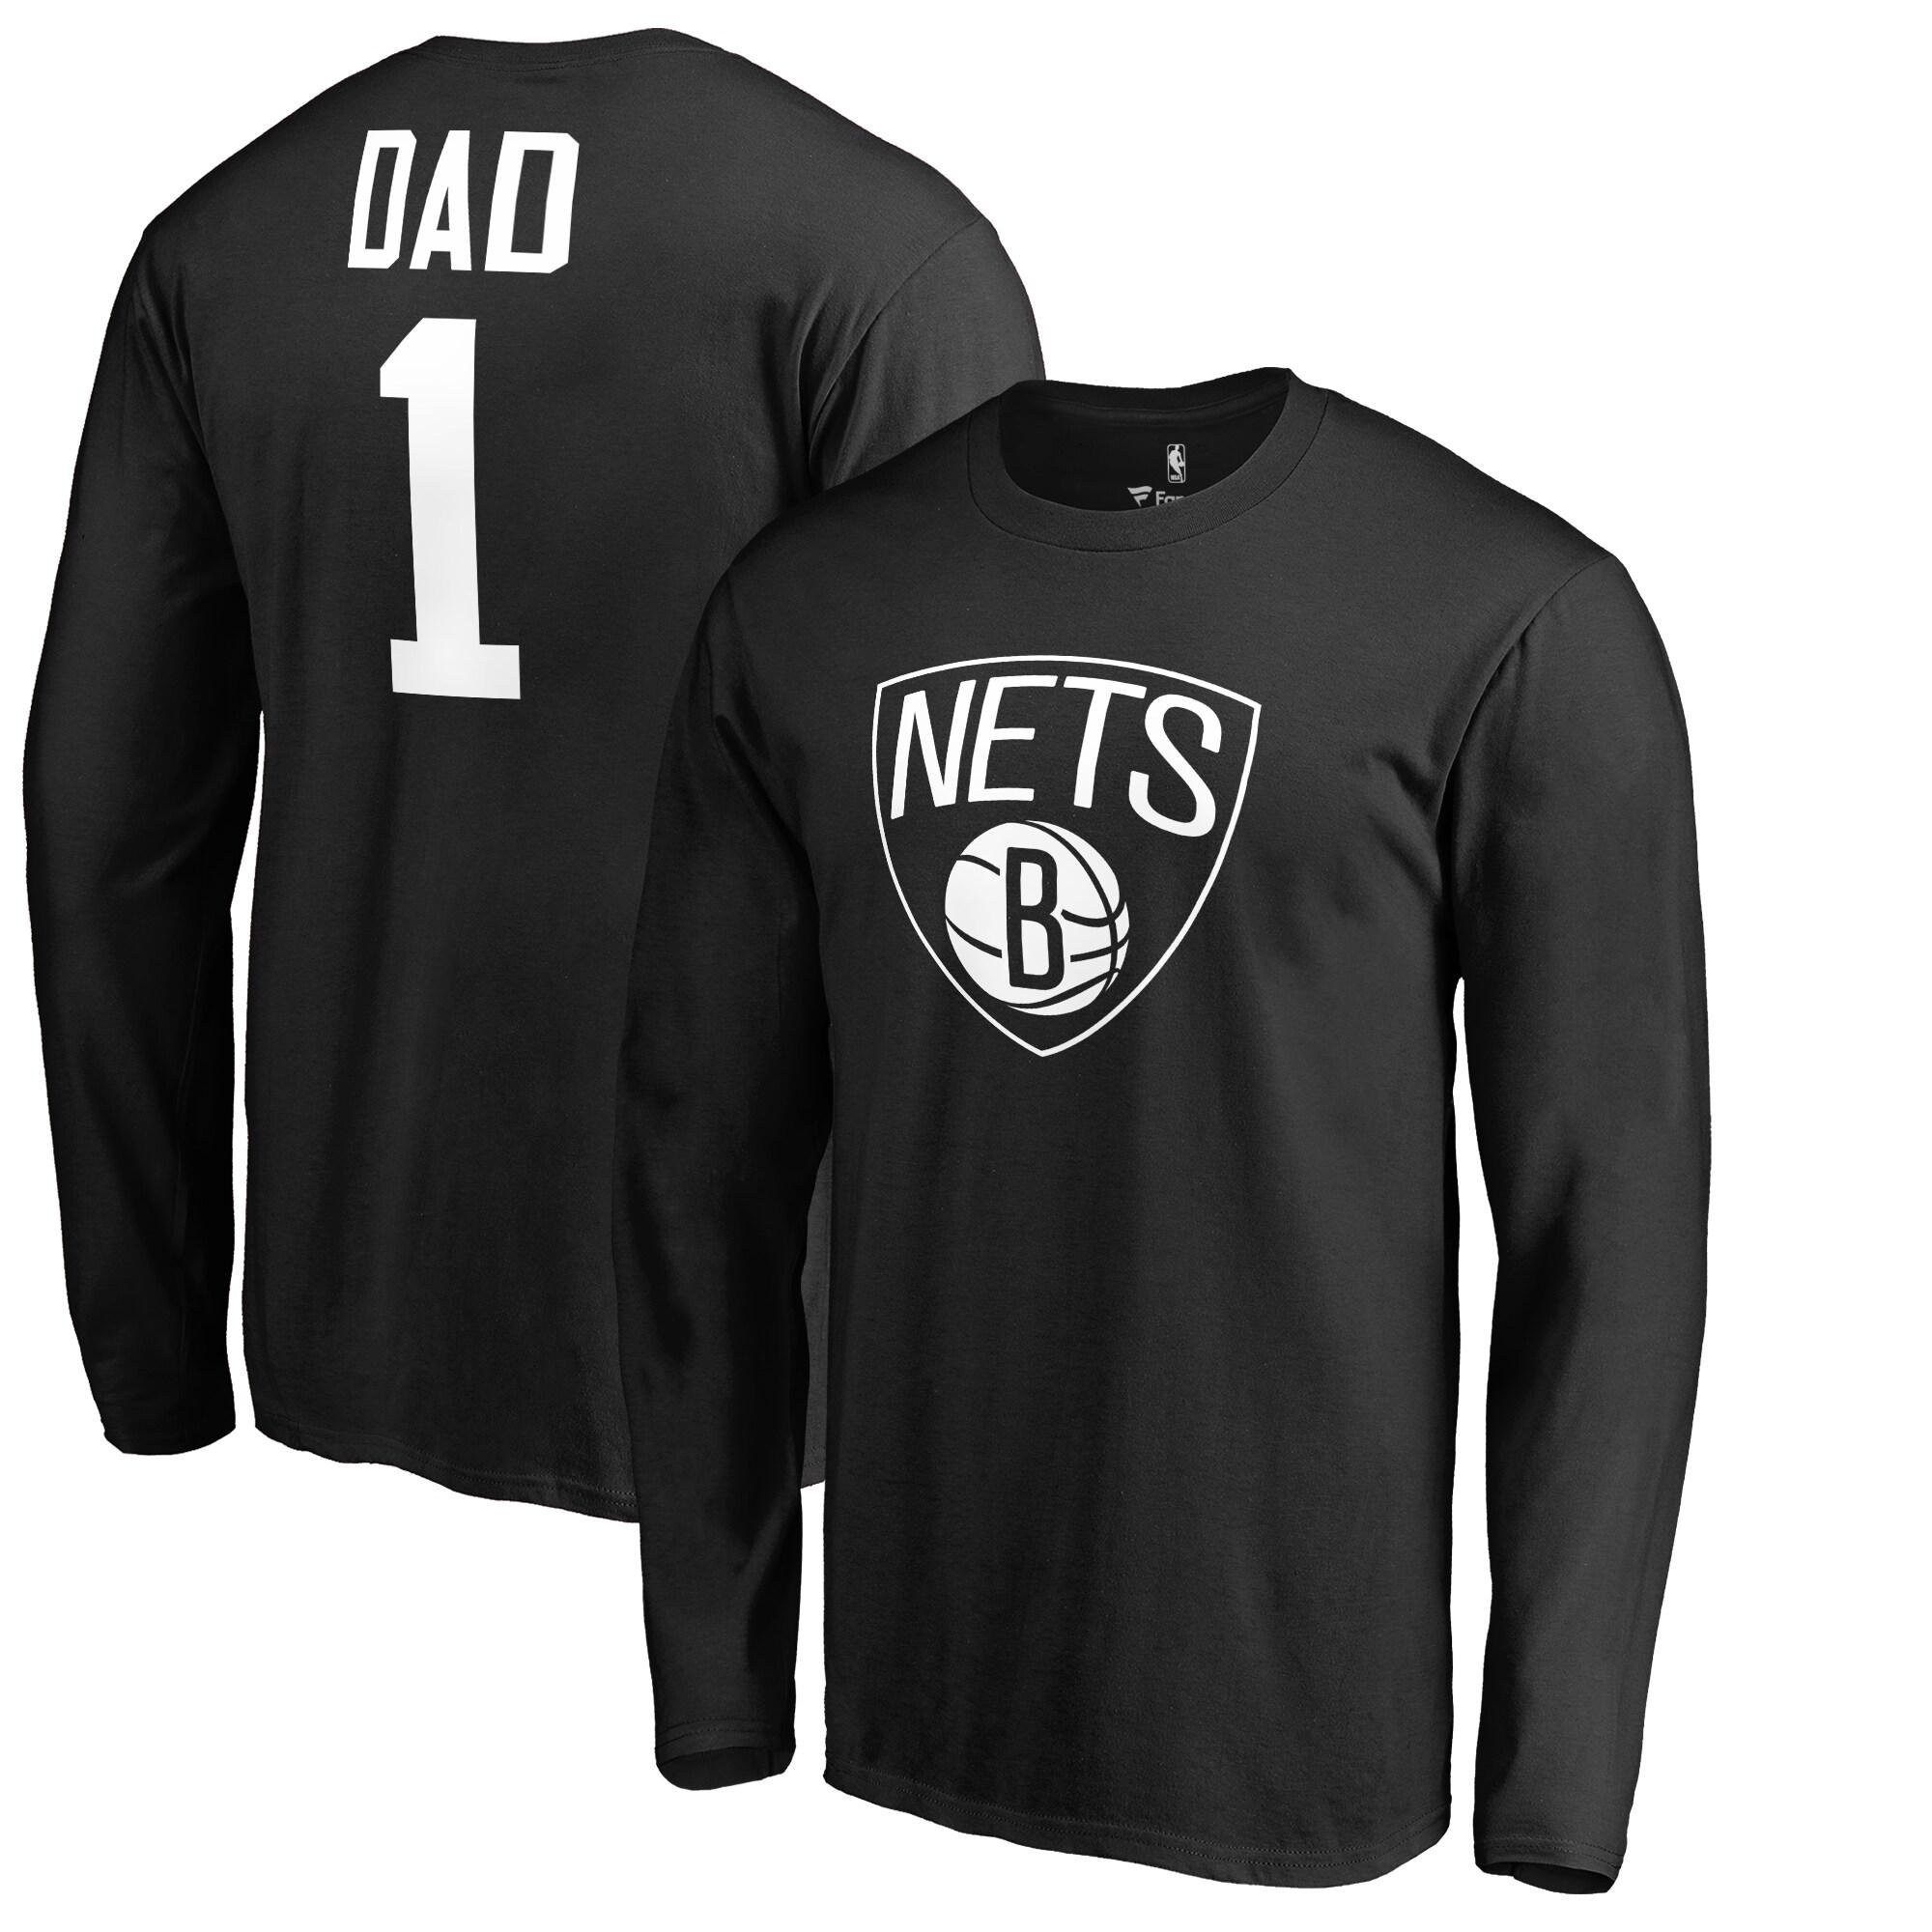 Brooklyn Nets Fanatics Branded Big & Tall #1 Dad Long Sleeve T-Shirt - Black